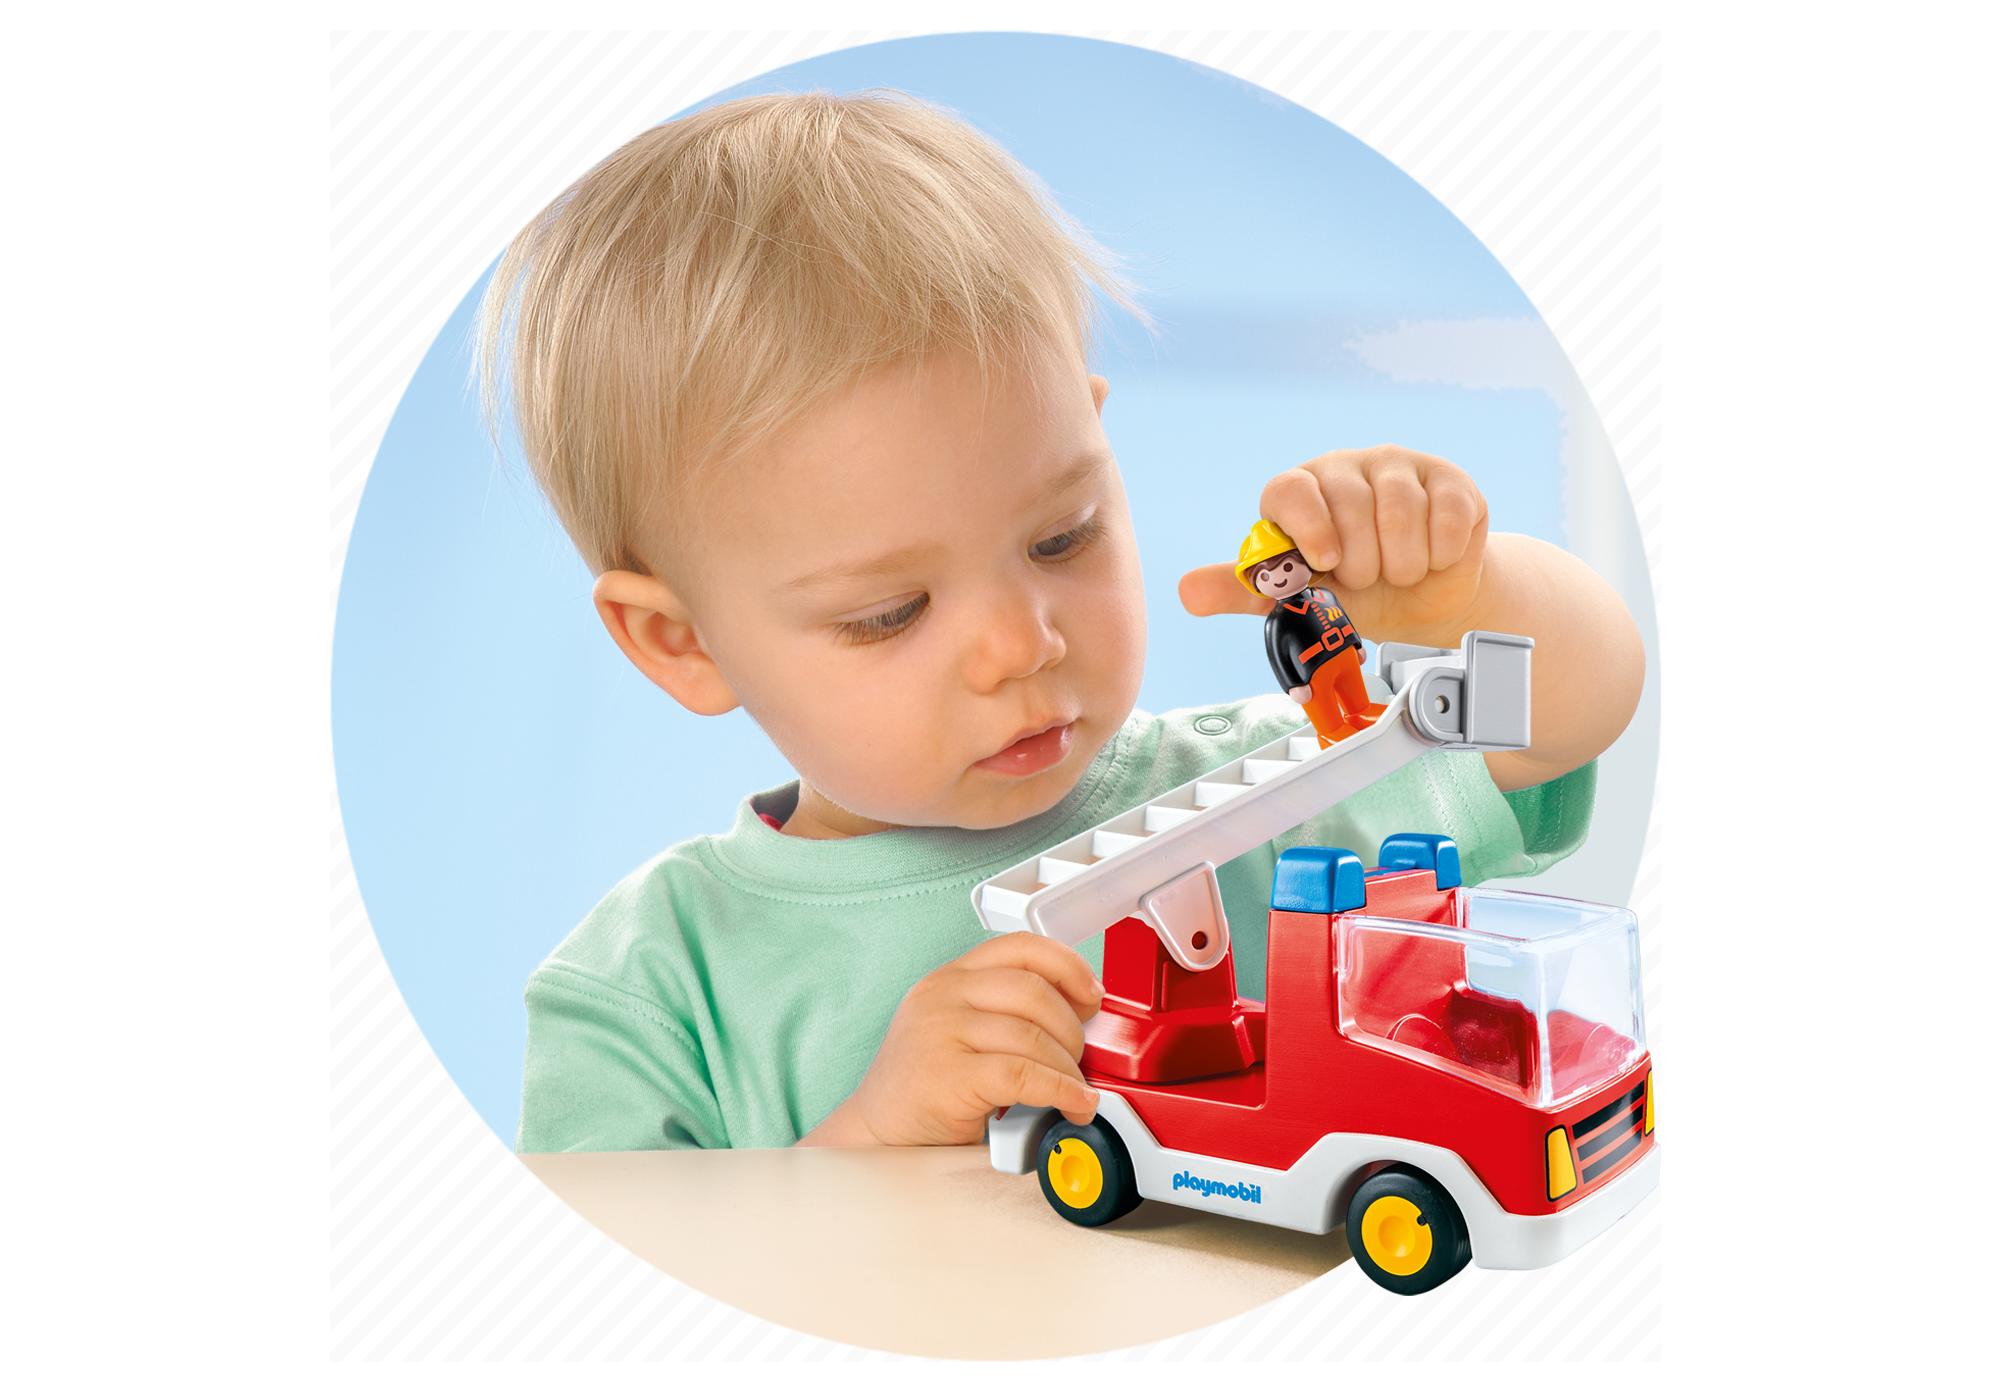 http://media.playmobil.com/i/playmobil/6967_product_extra1